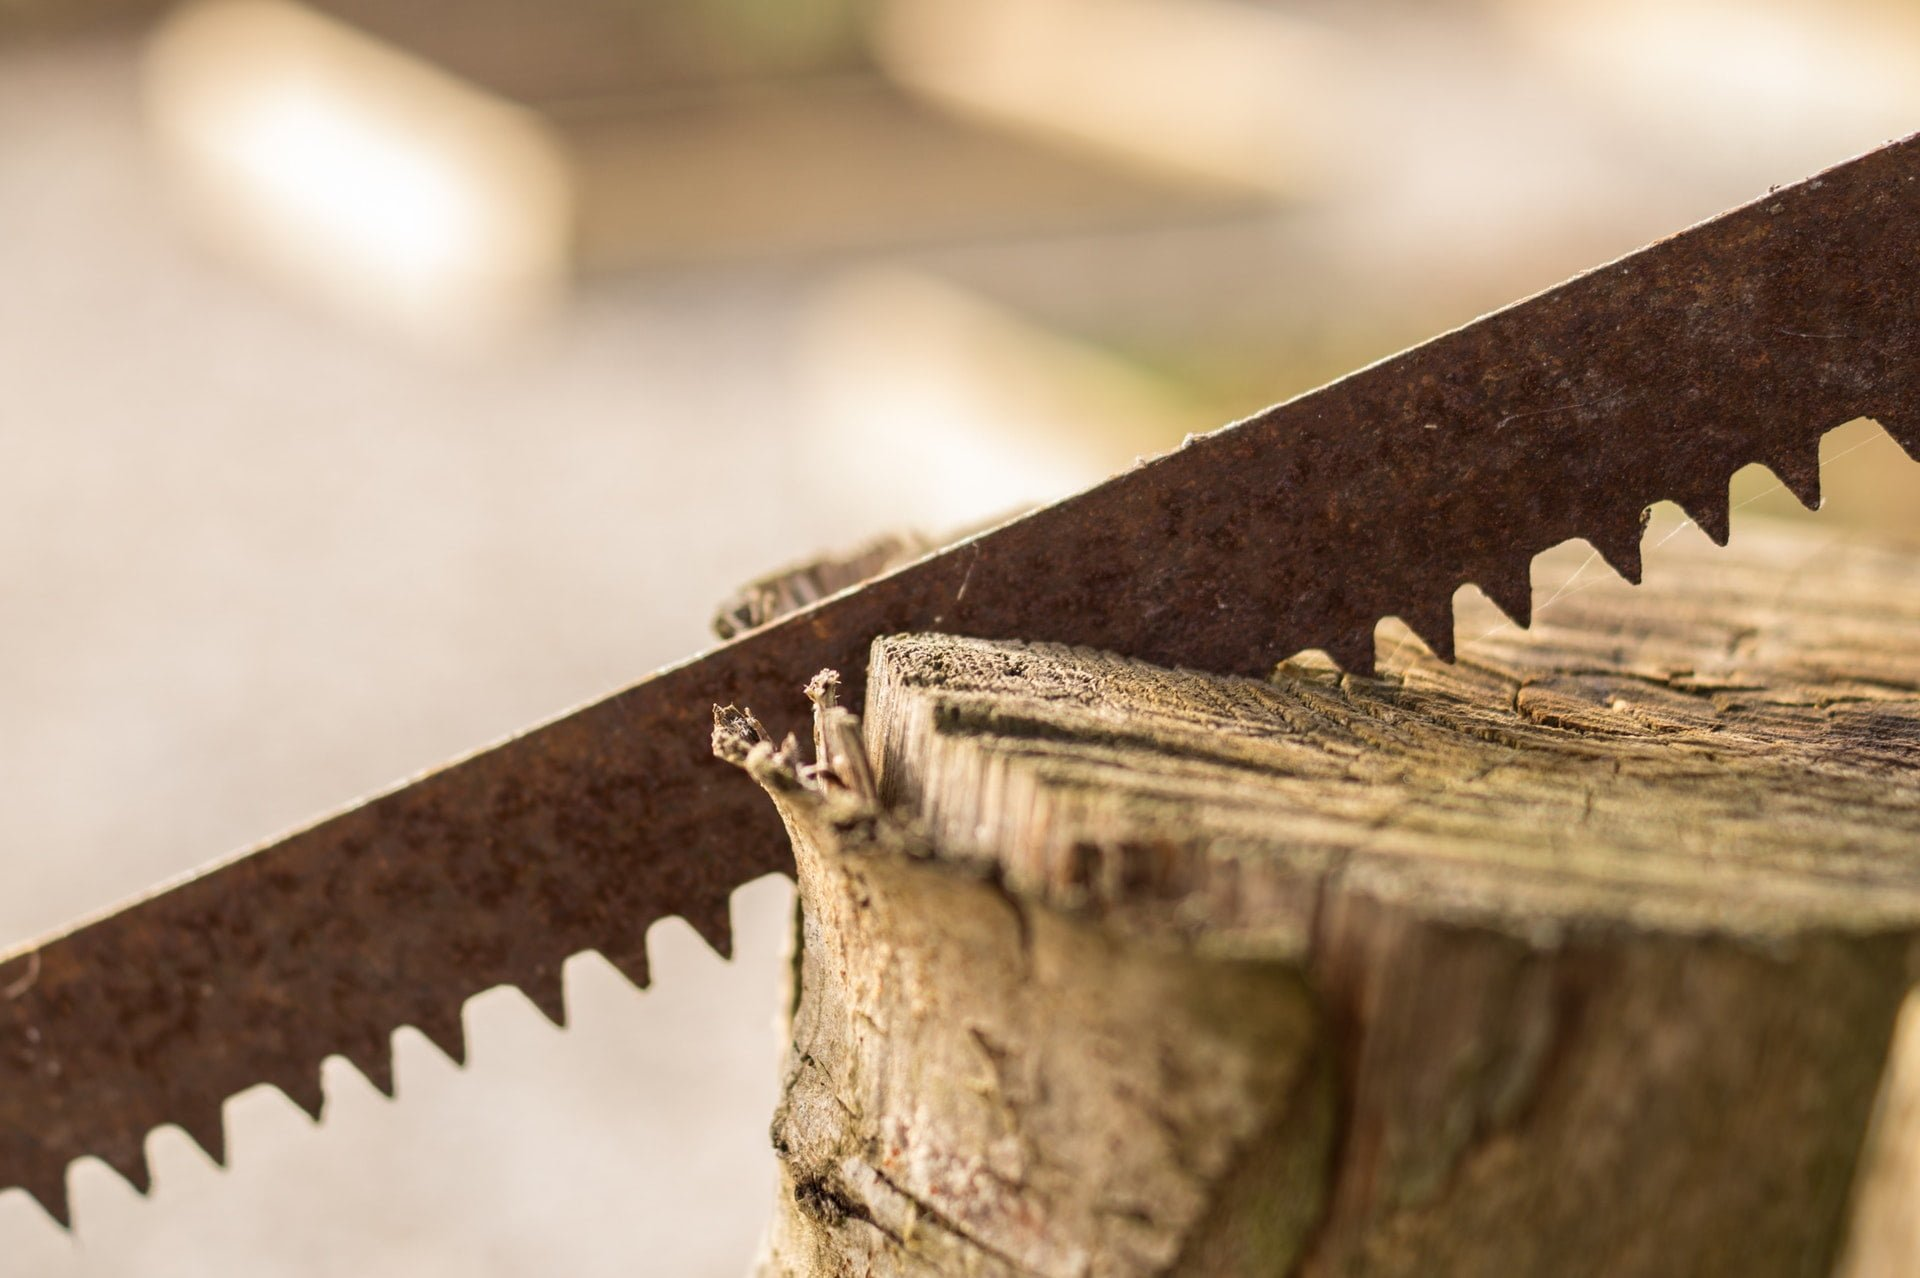 wood working garden tool saw 1 世界伐木大賽有哪六種競技項目?